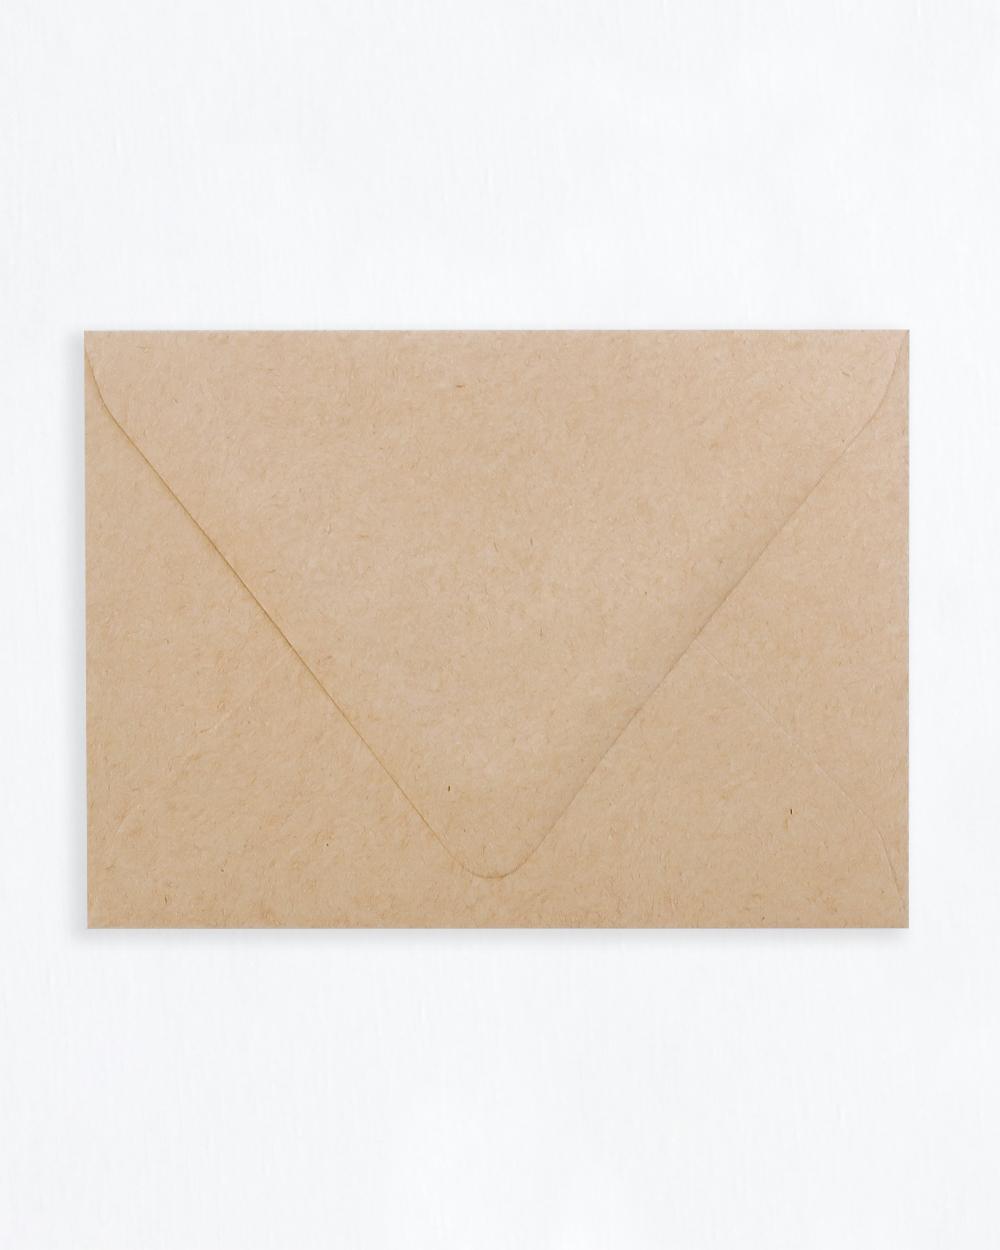 Kirjekuori ruskea